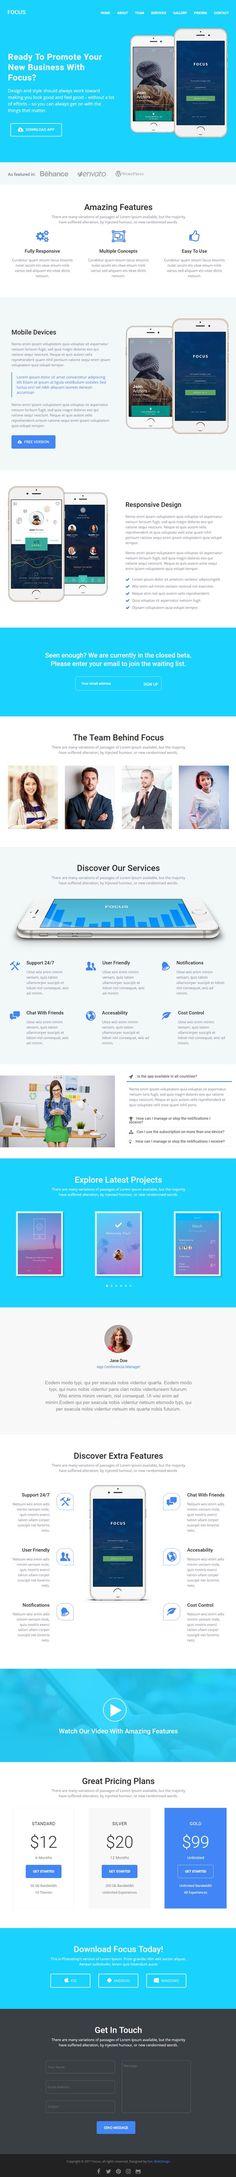 Focus High-Converting Landing Page WordPress Theme #bestof2017 #bestwordpressthemes #businessthemes #corporatethemes #wordpressthemes